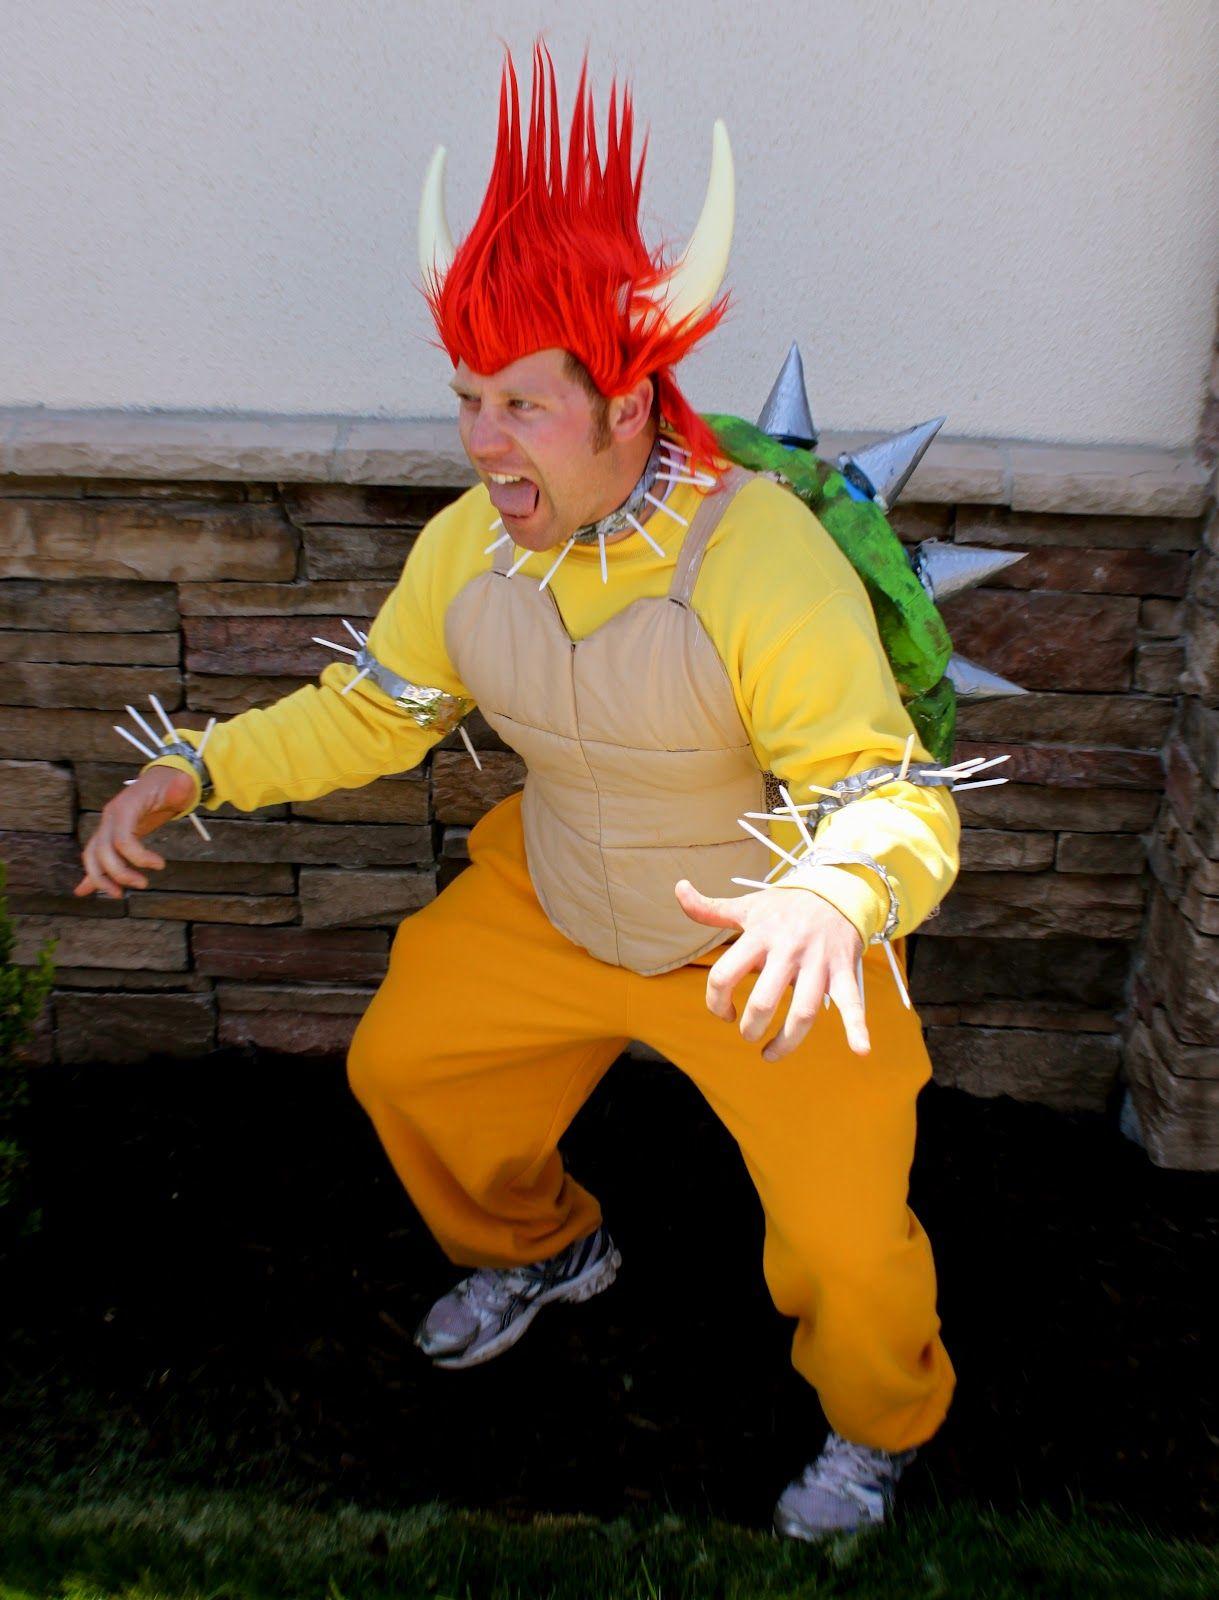 Bowser koopa costume show 5 show all mario kart